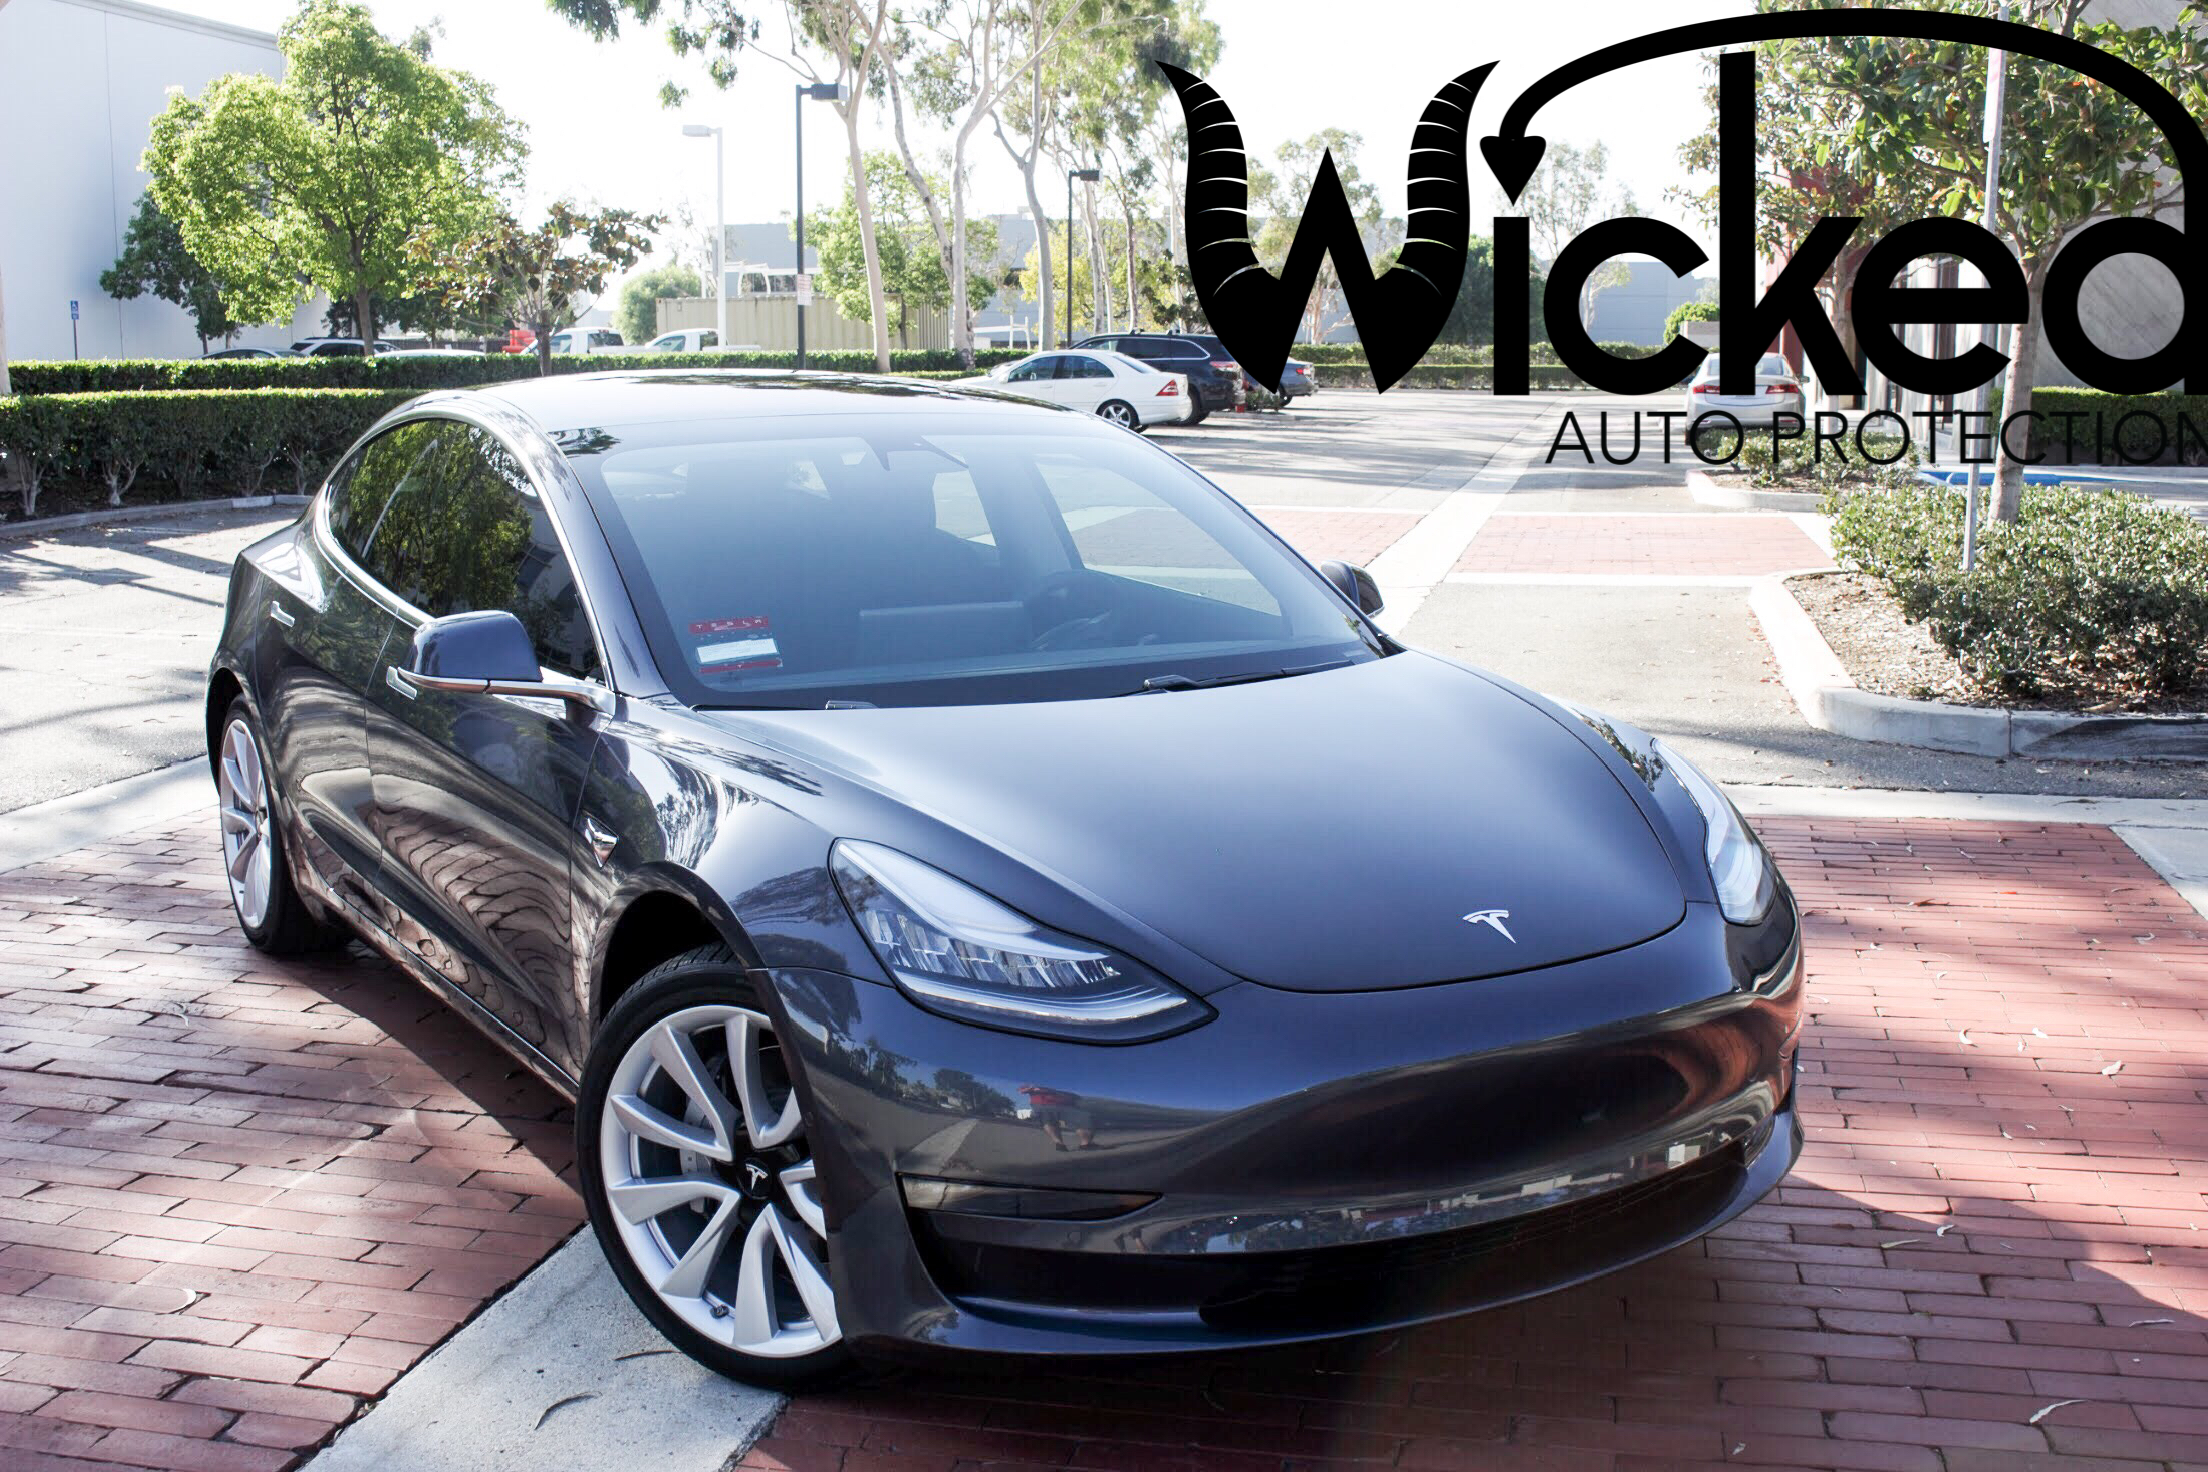 Wicked Auto Protection | Tesla Specials | Irvine, Ca